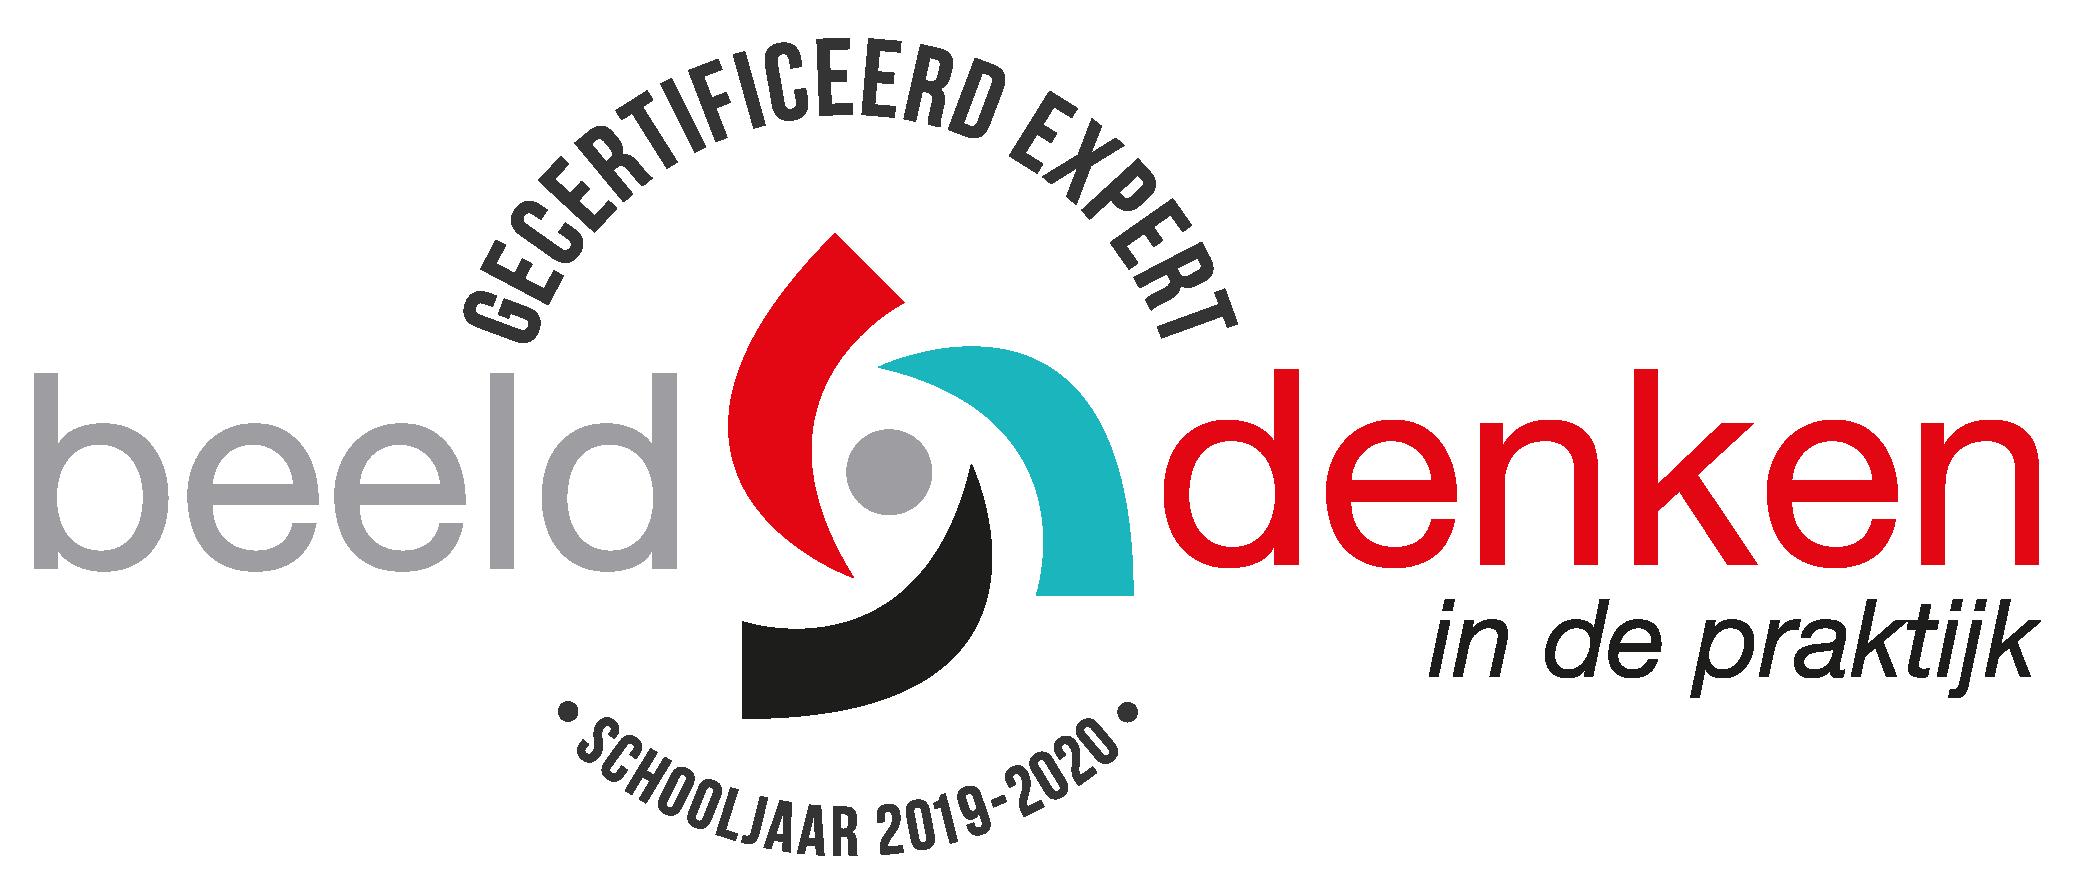 gecertificeerd_expert_BDIP_2019-2020